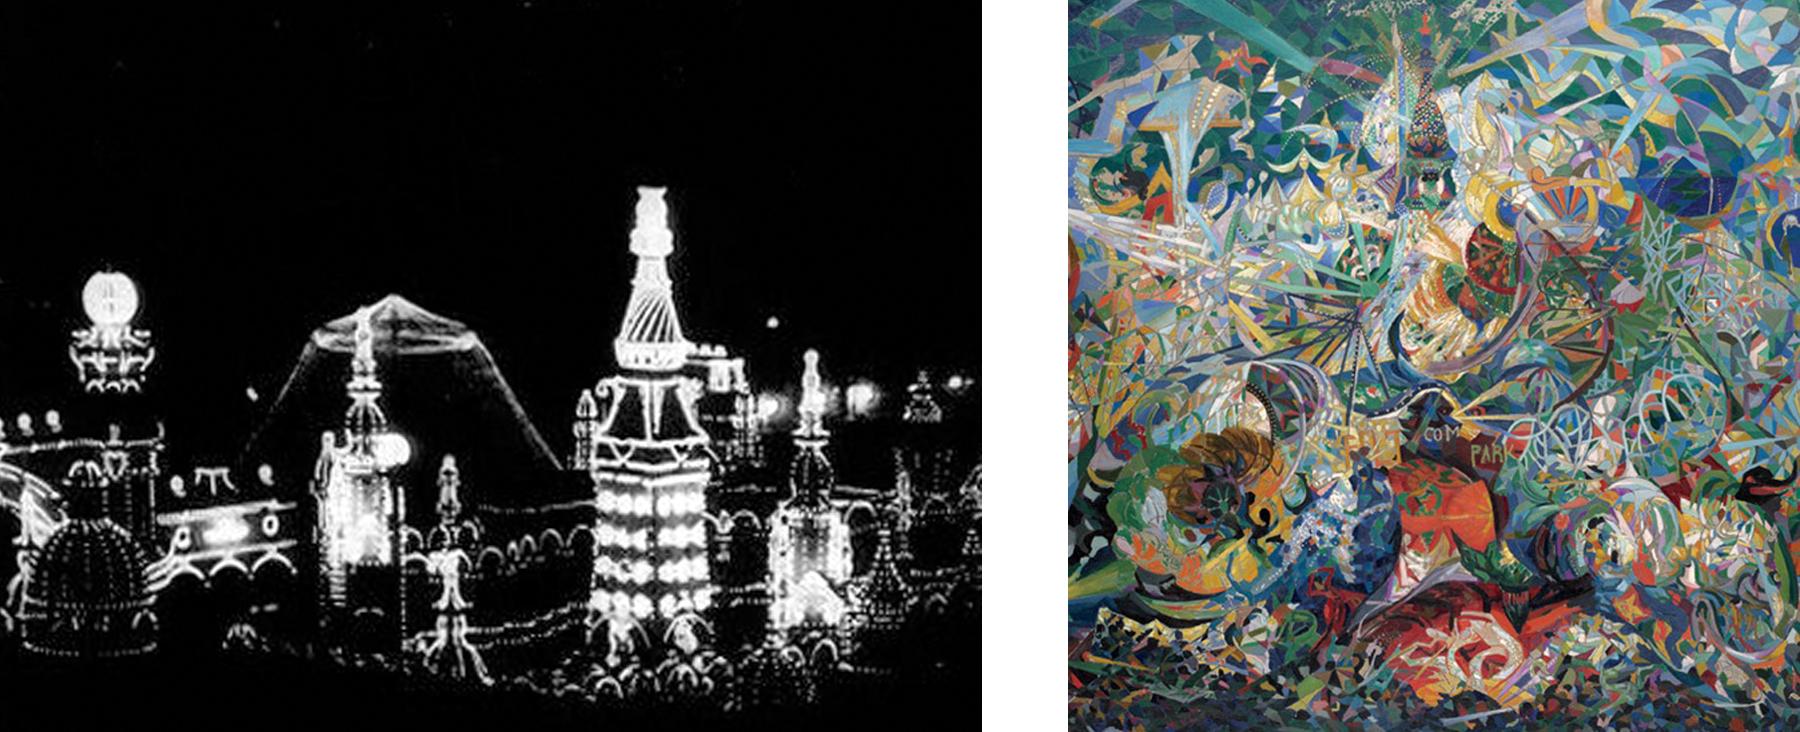 Two depictions of Luna Park. L: Film still, Coney Island at Night, 1905. Camera: Edwin S. Porter, The Edison Manufacturing Company. R: Joseph Stella, Battle of Lights, Coney Island, Mardi Gras, 1913-1914. Oil on canvas, 77 x 84 3/4 in. Yale University Art Gallery, New Haven, CT